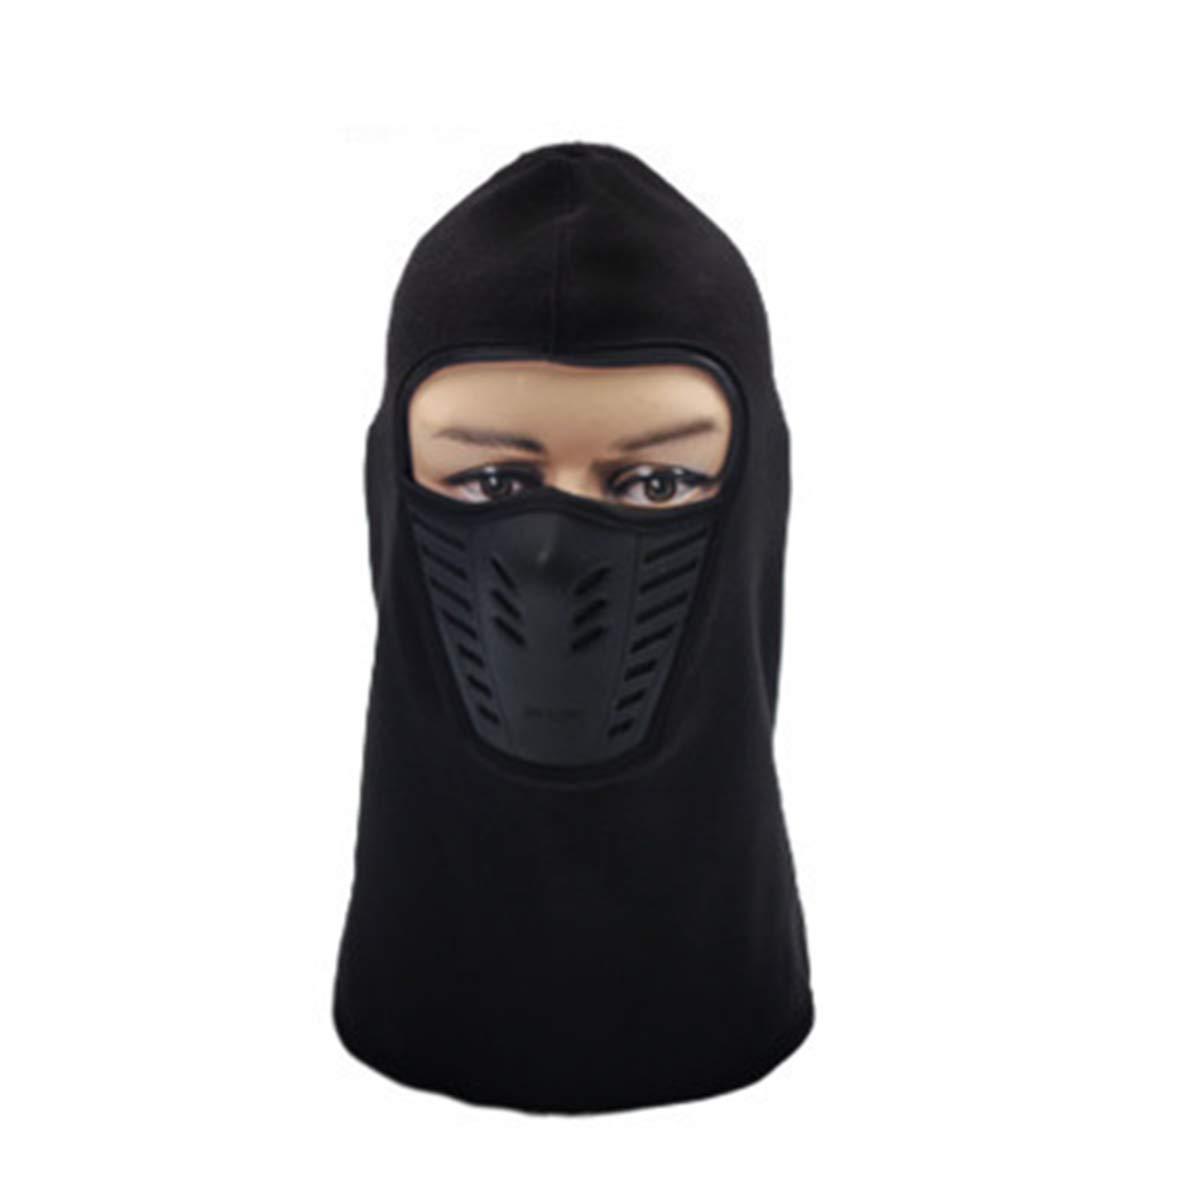 ZumZup Balaclava Ski Mask Unisex Winter Neckerchief Multifunction Fleece Warm Full Face Cover Anti-dust Windproof Hats